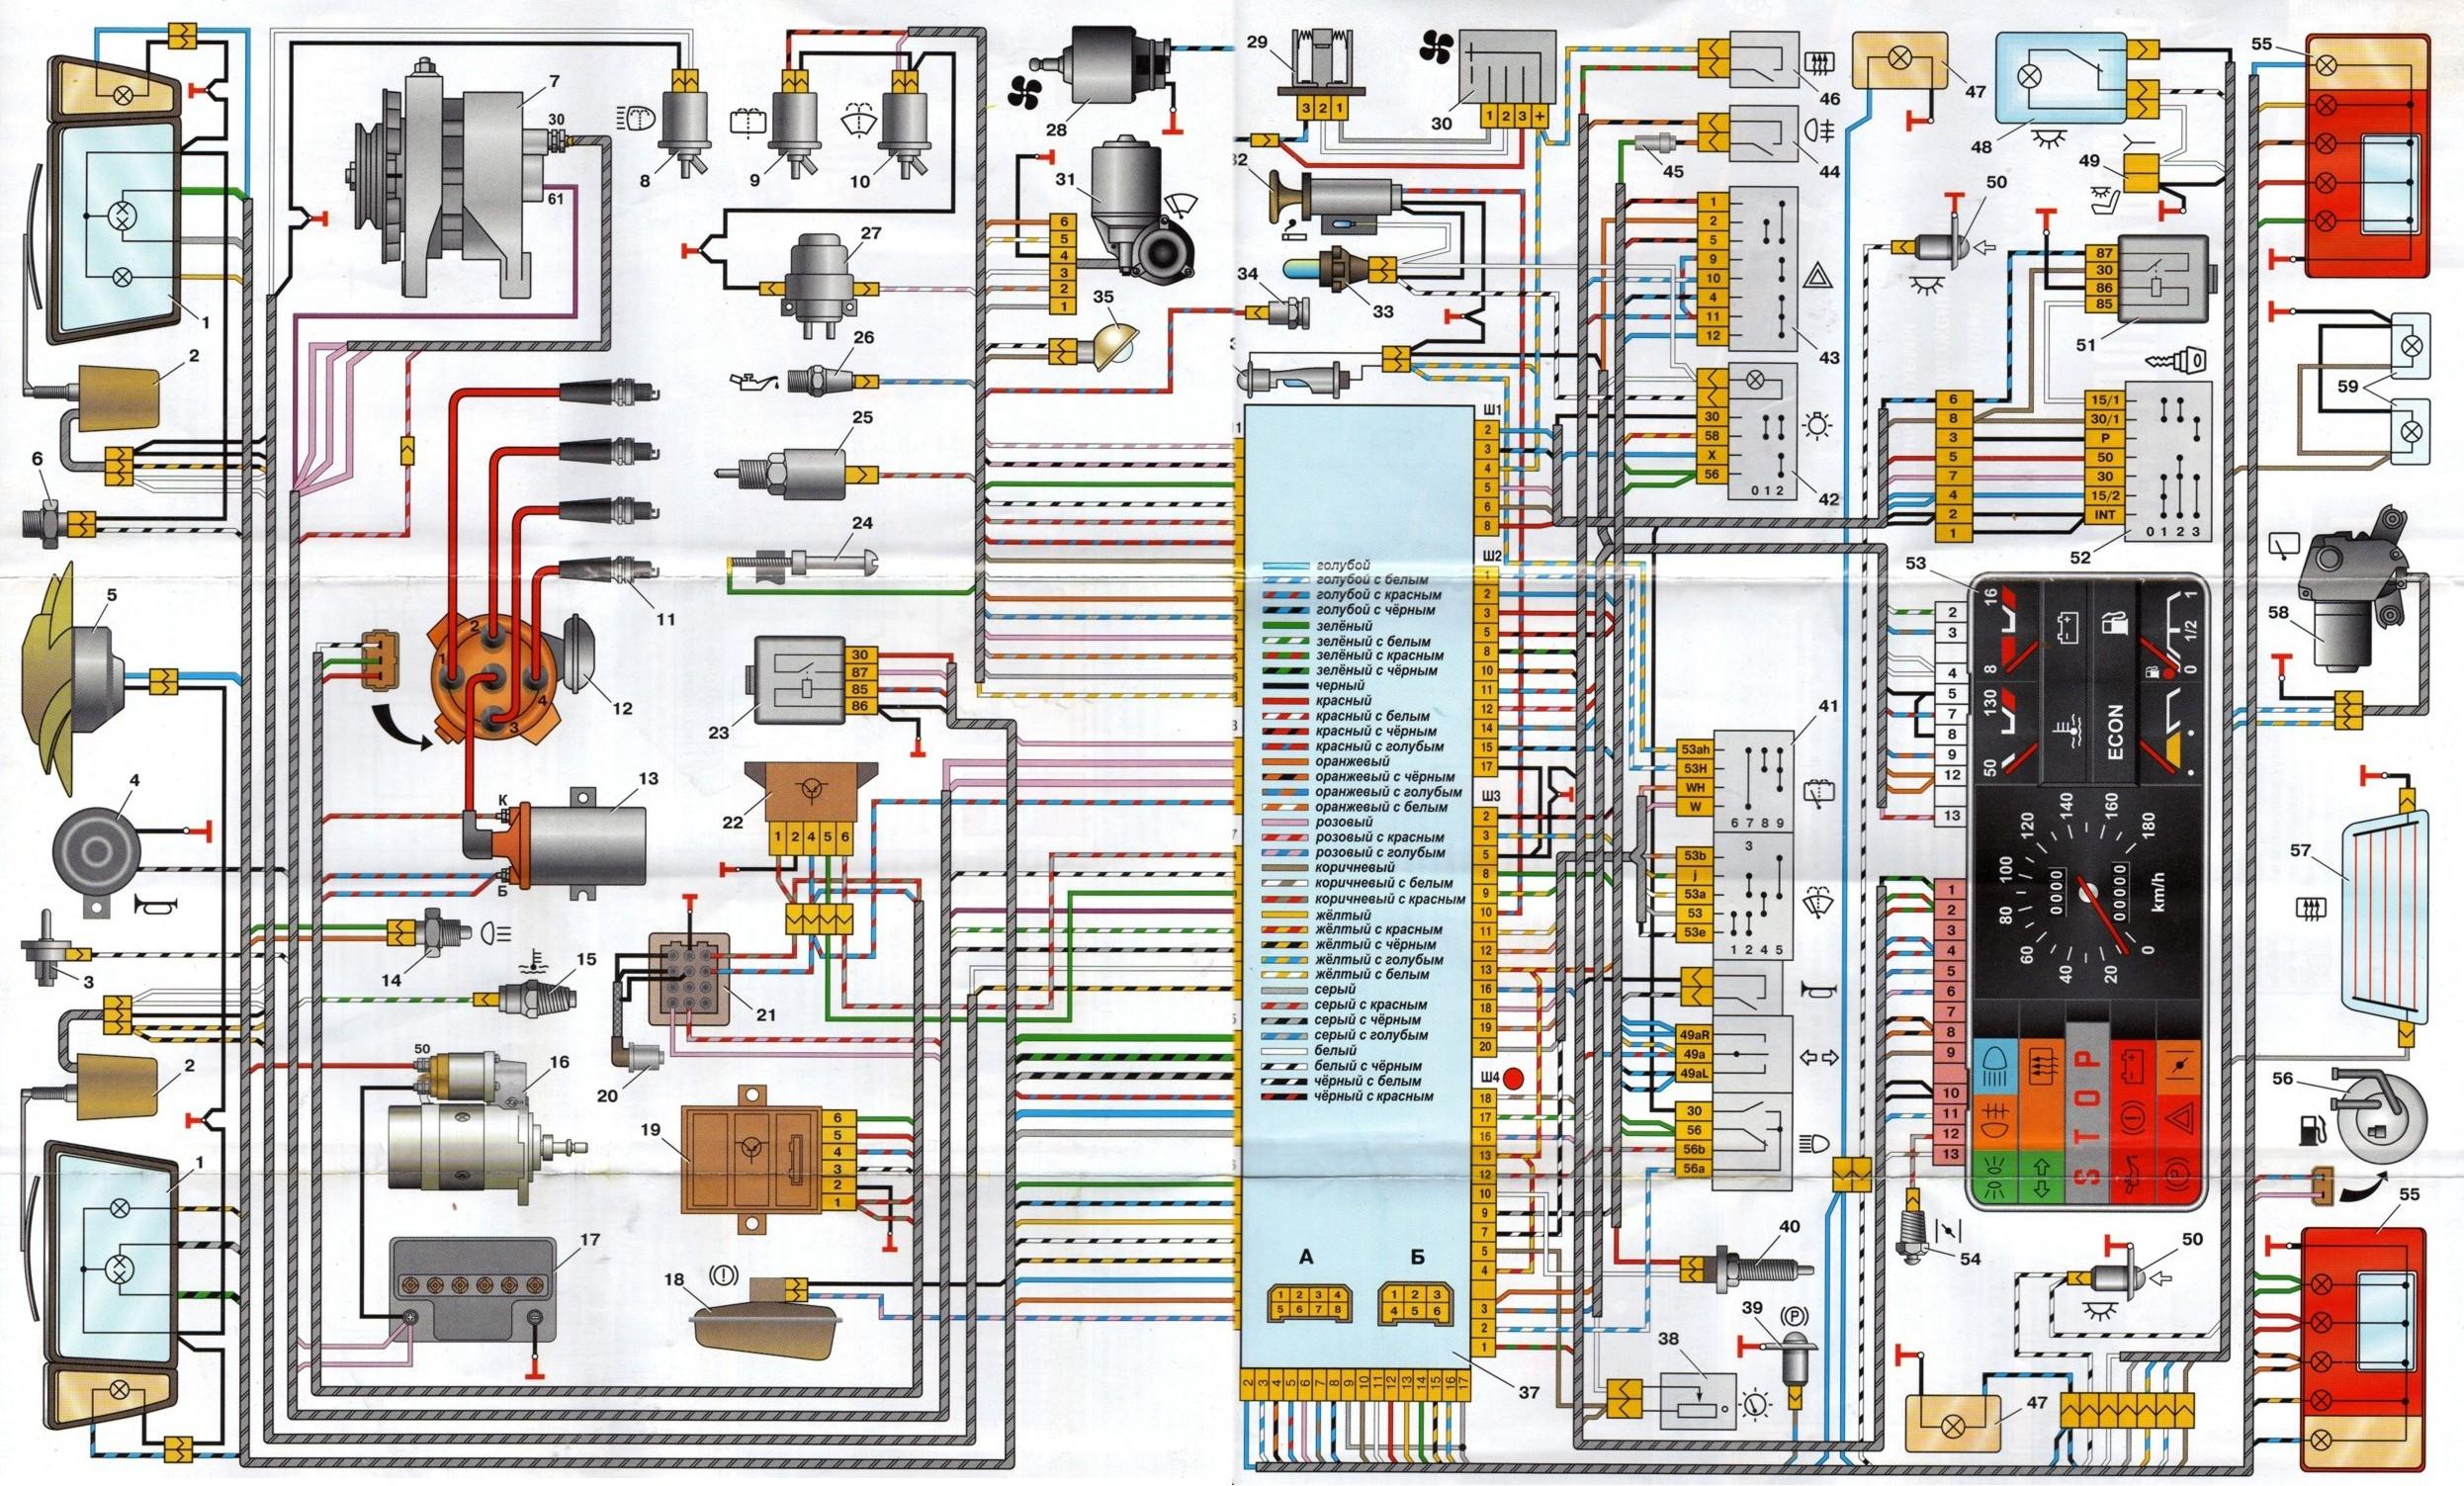 Схема электрооборудования автомобиля ВАЗ 2109 Самара.